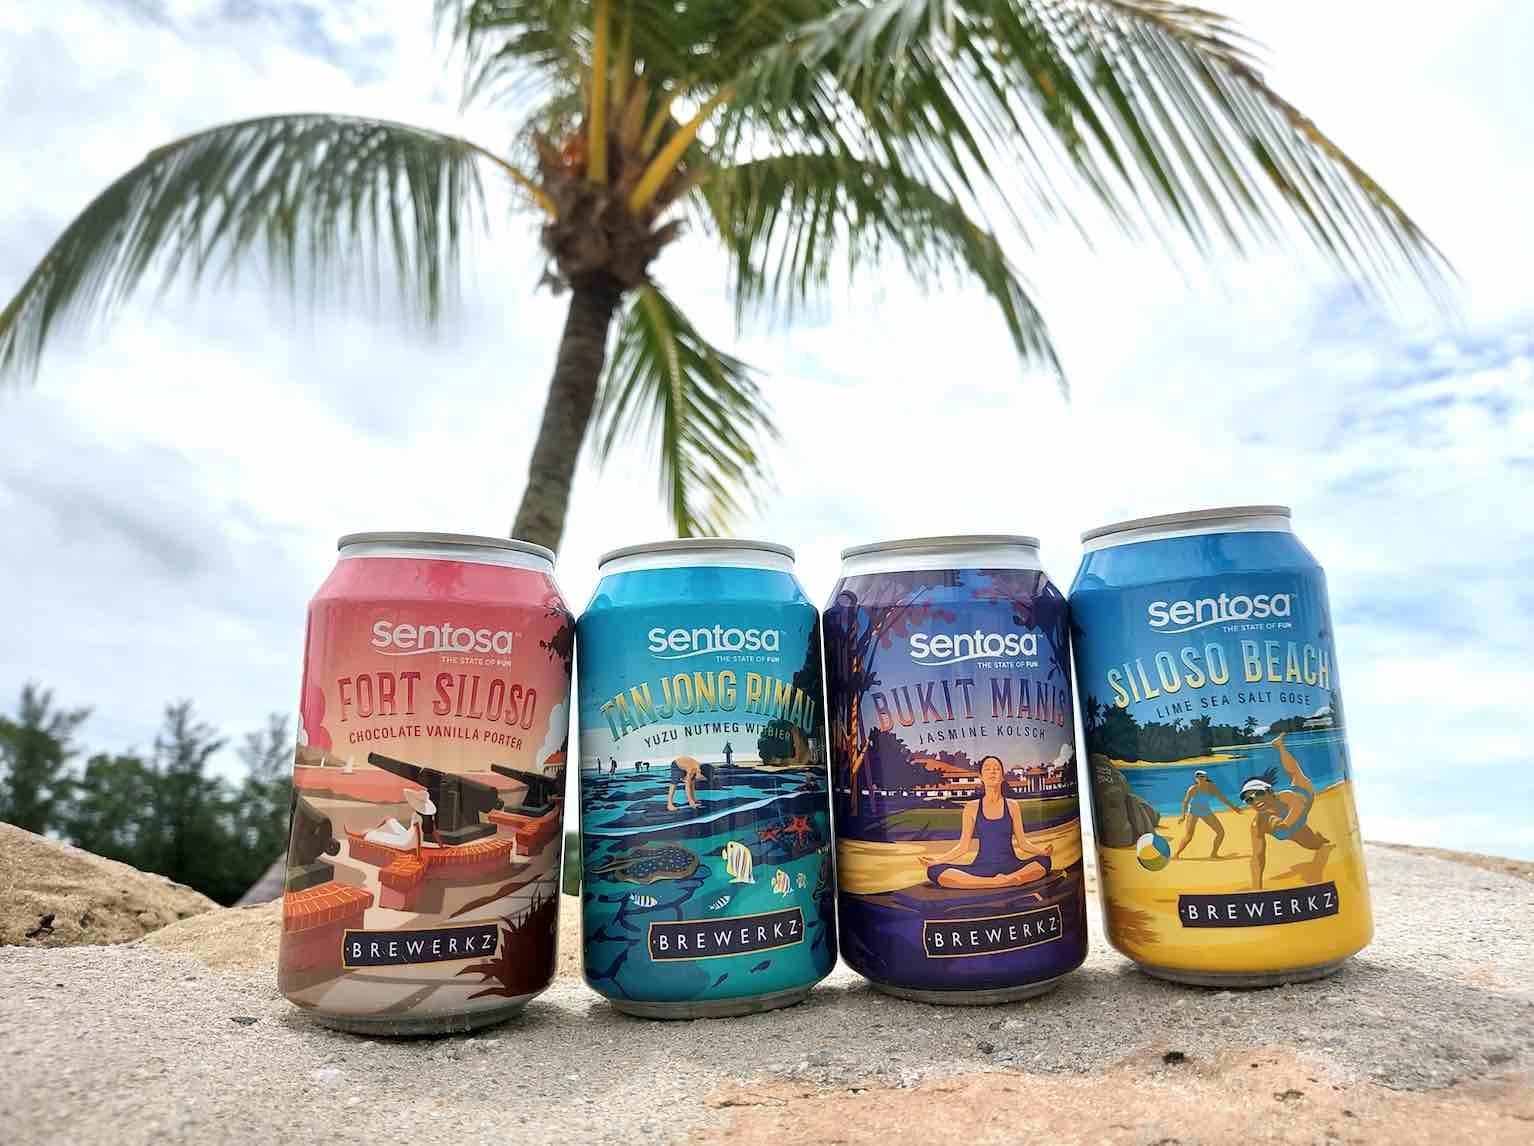 Image of beers